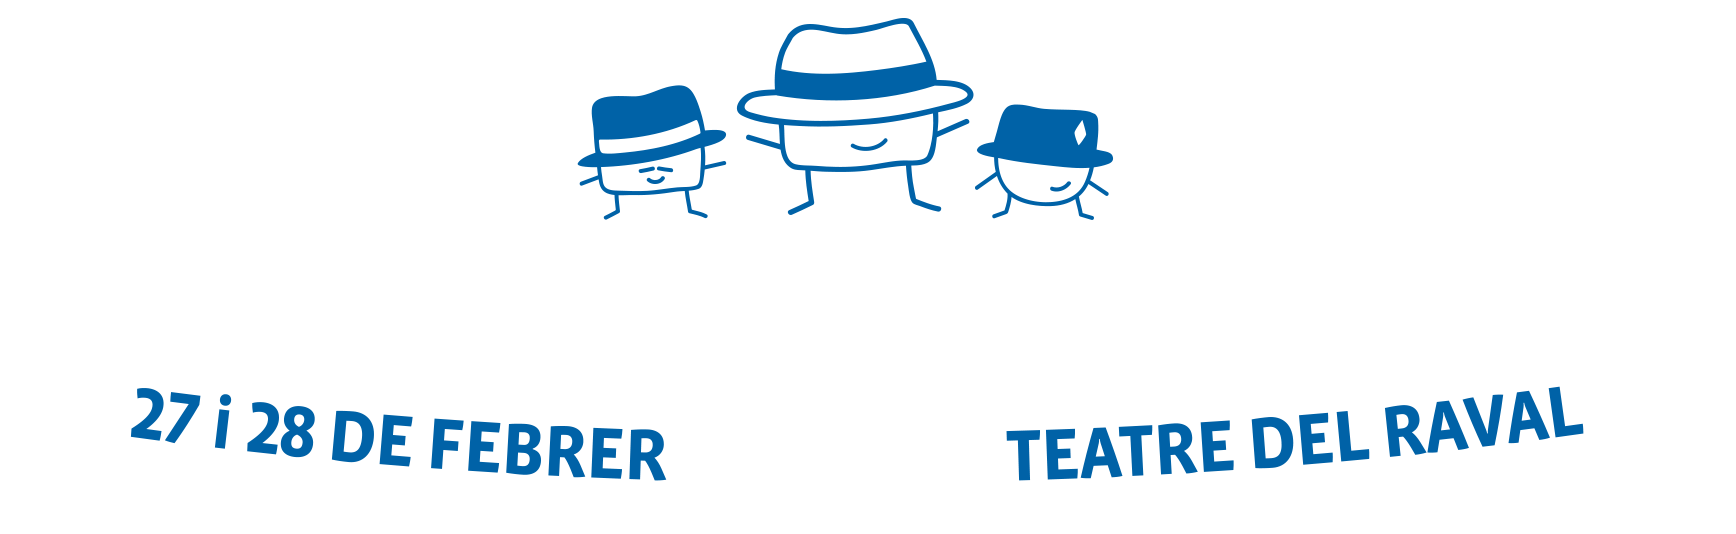 Sona Baixet Fest